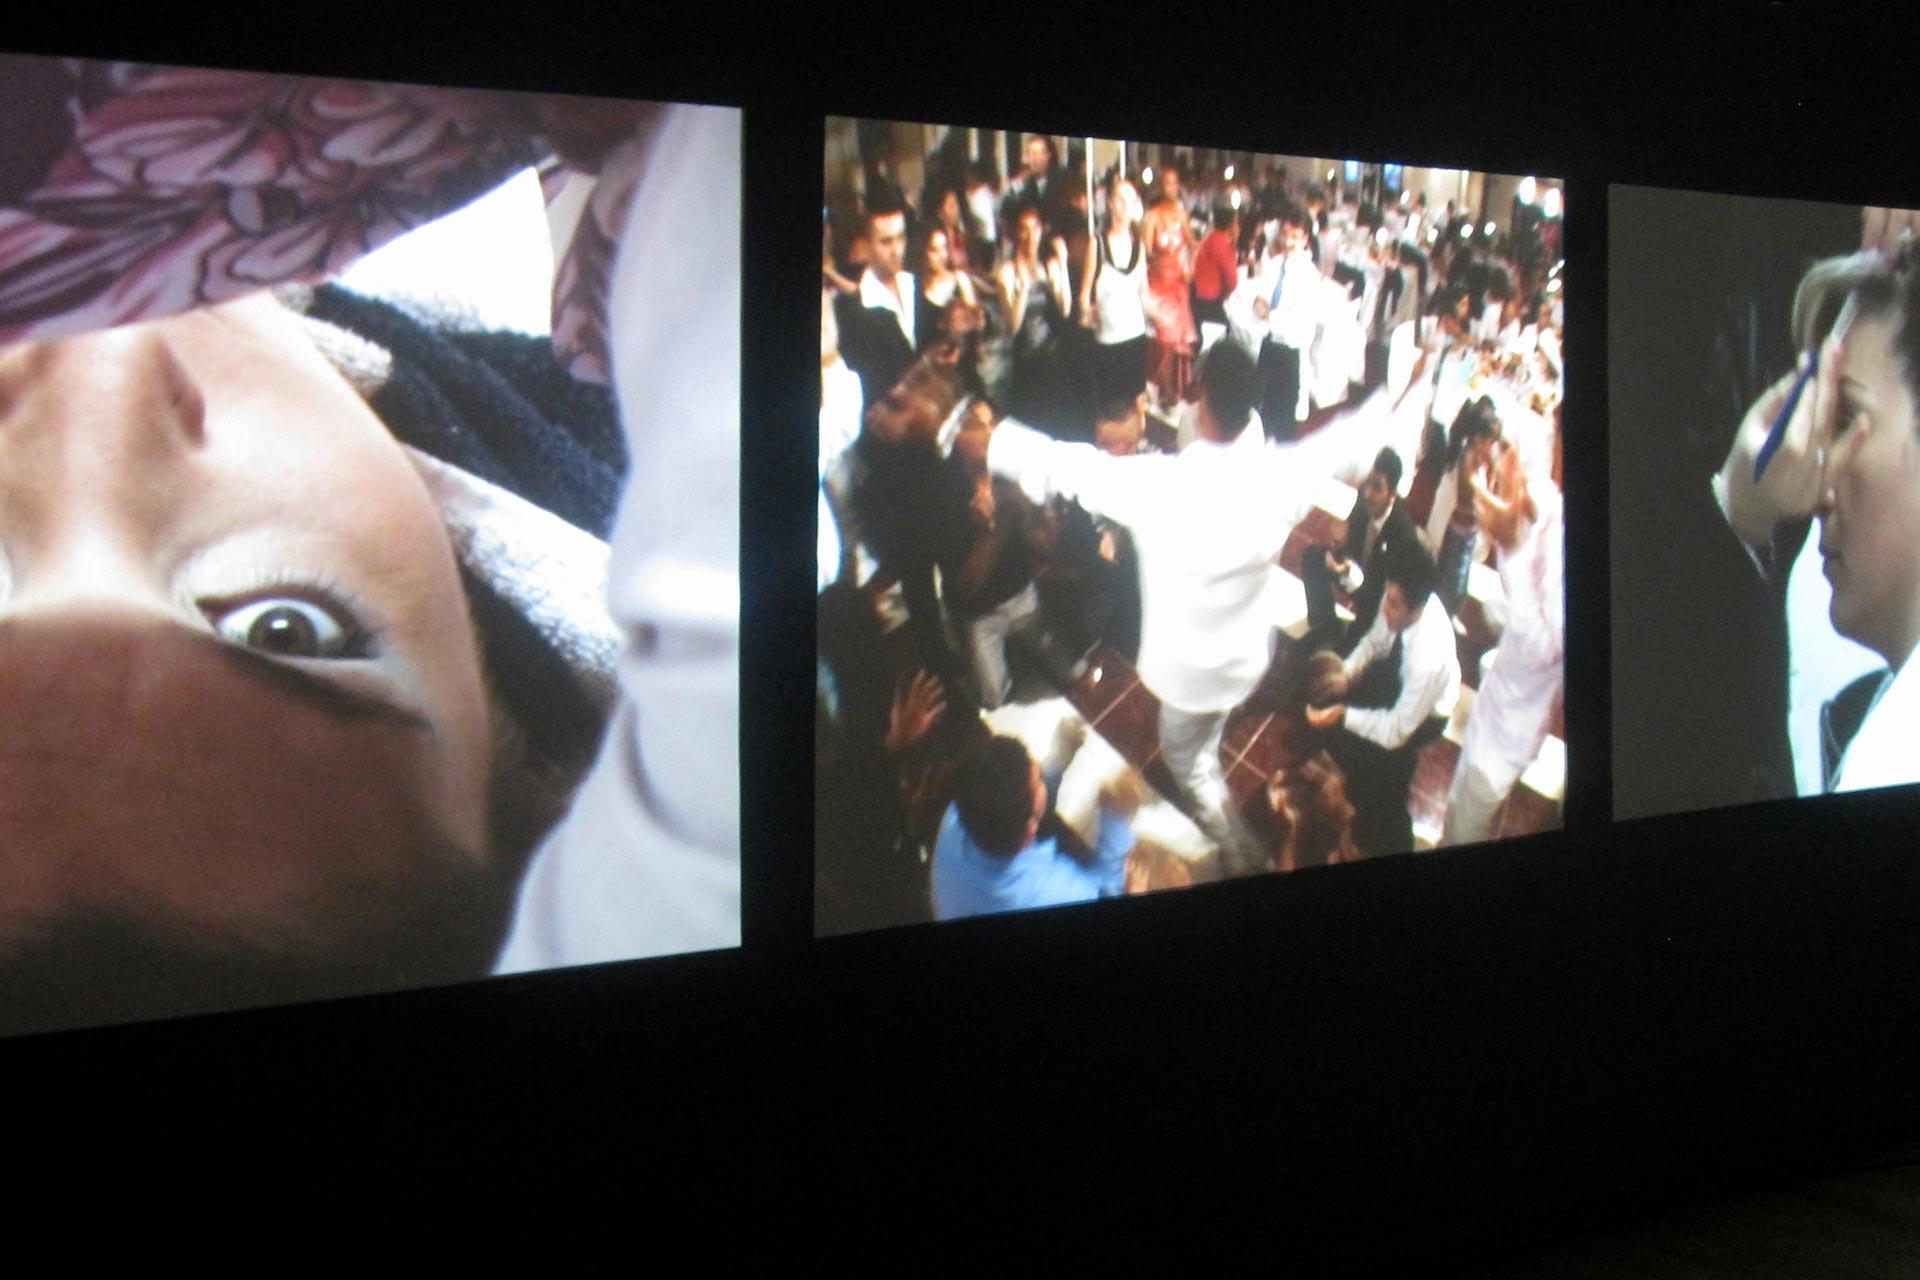 Koken-Ergun-Kunsthalle-Winterthur-2011-1.jpg